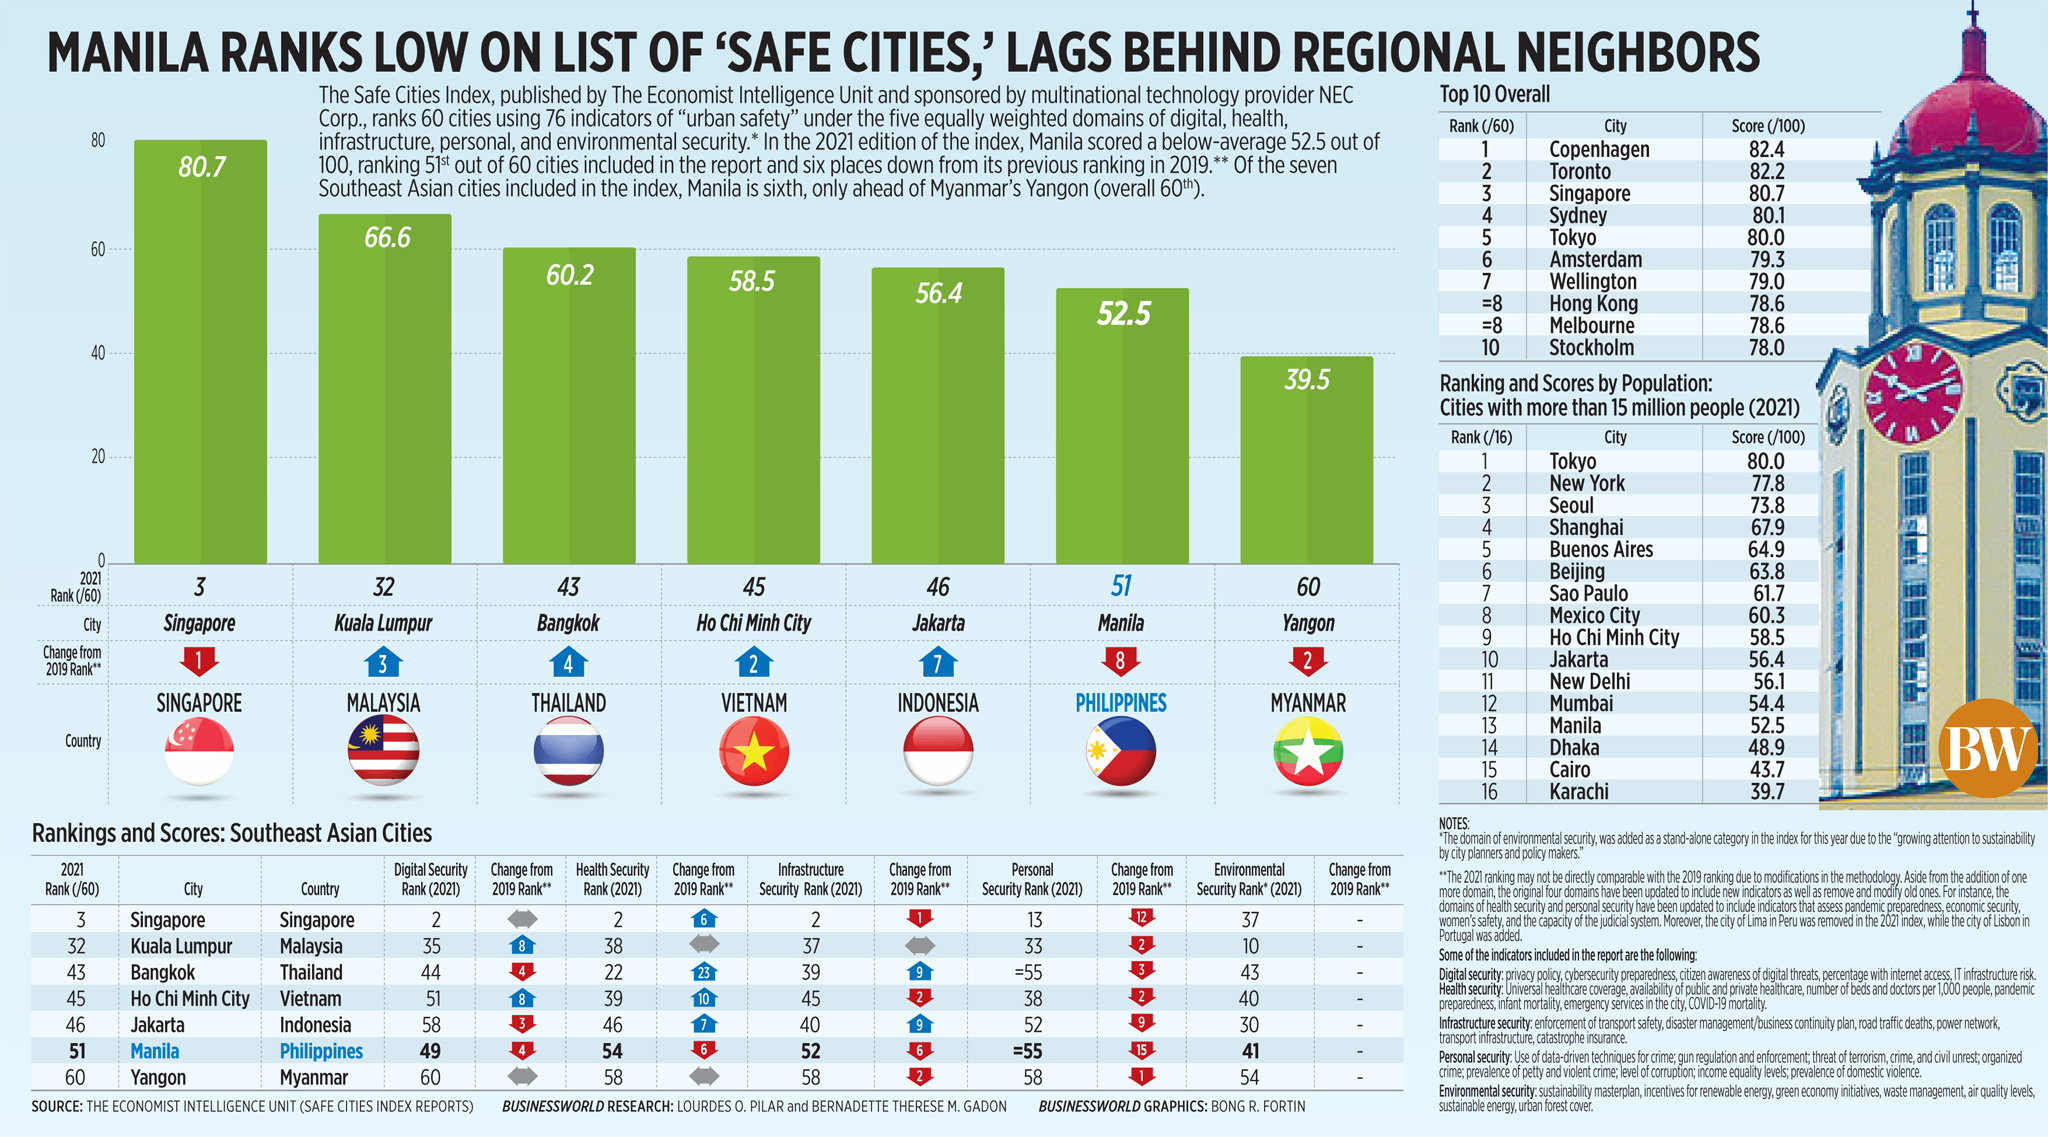 Manila ranks low on list of 'safe cities,' lags behind regional neighbors